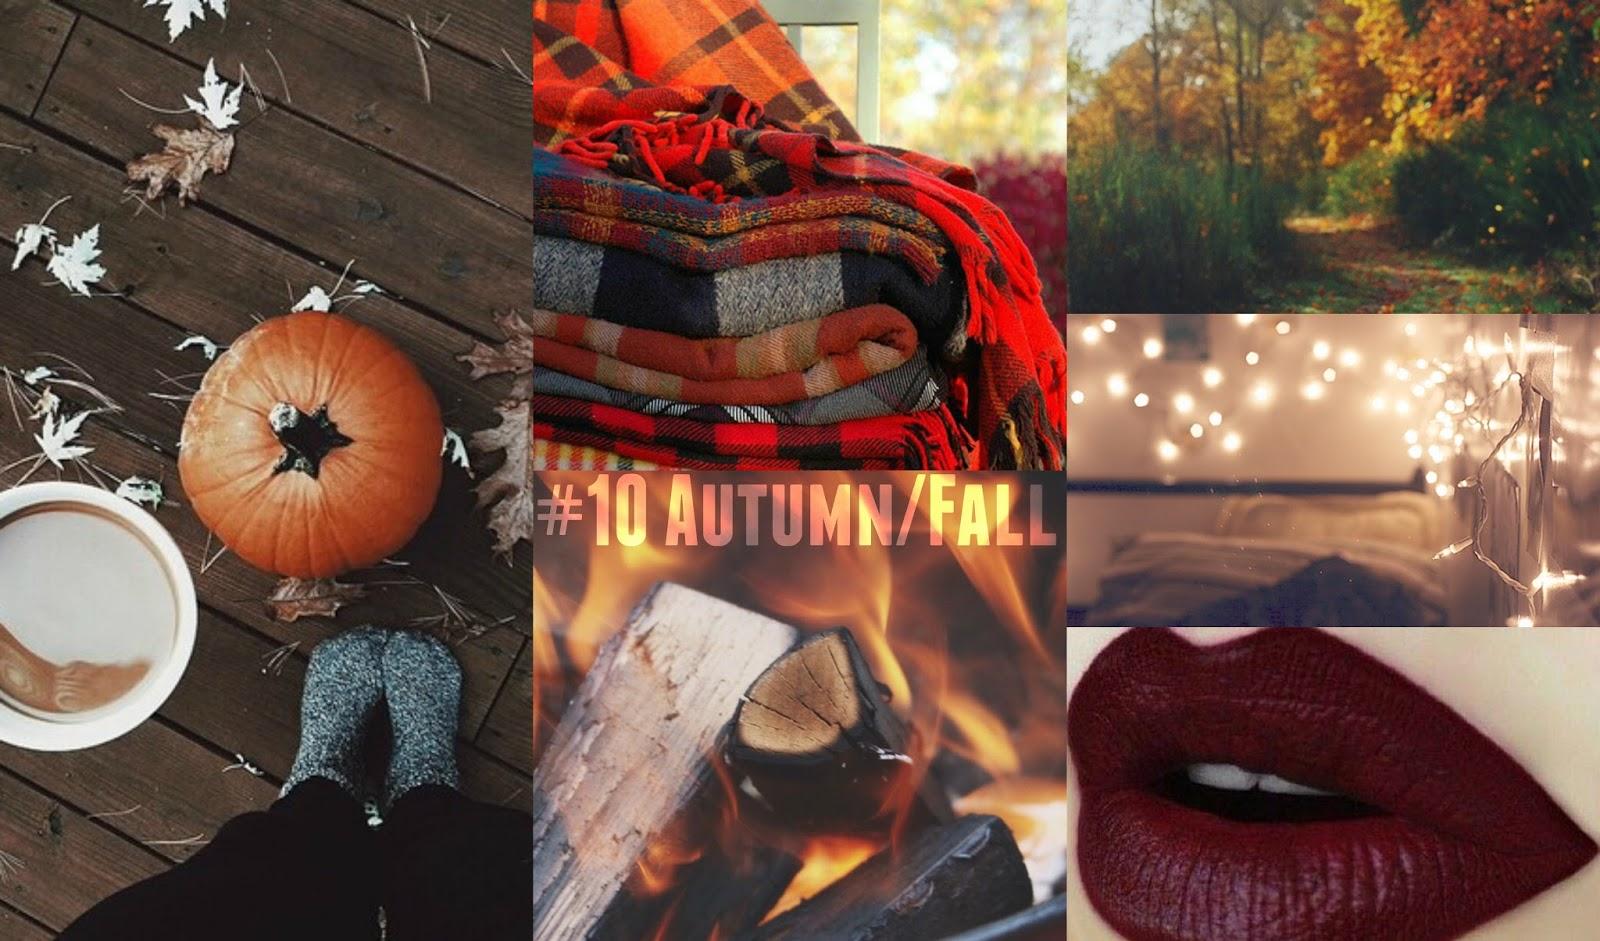 The Sunday Topic No.10 Autumn/Fall